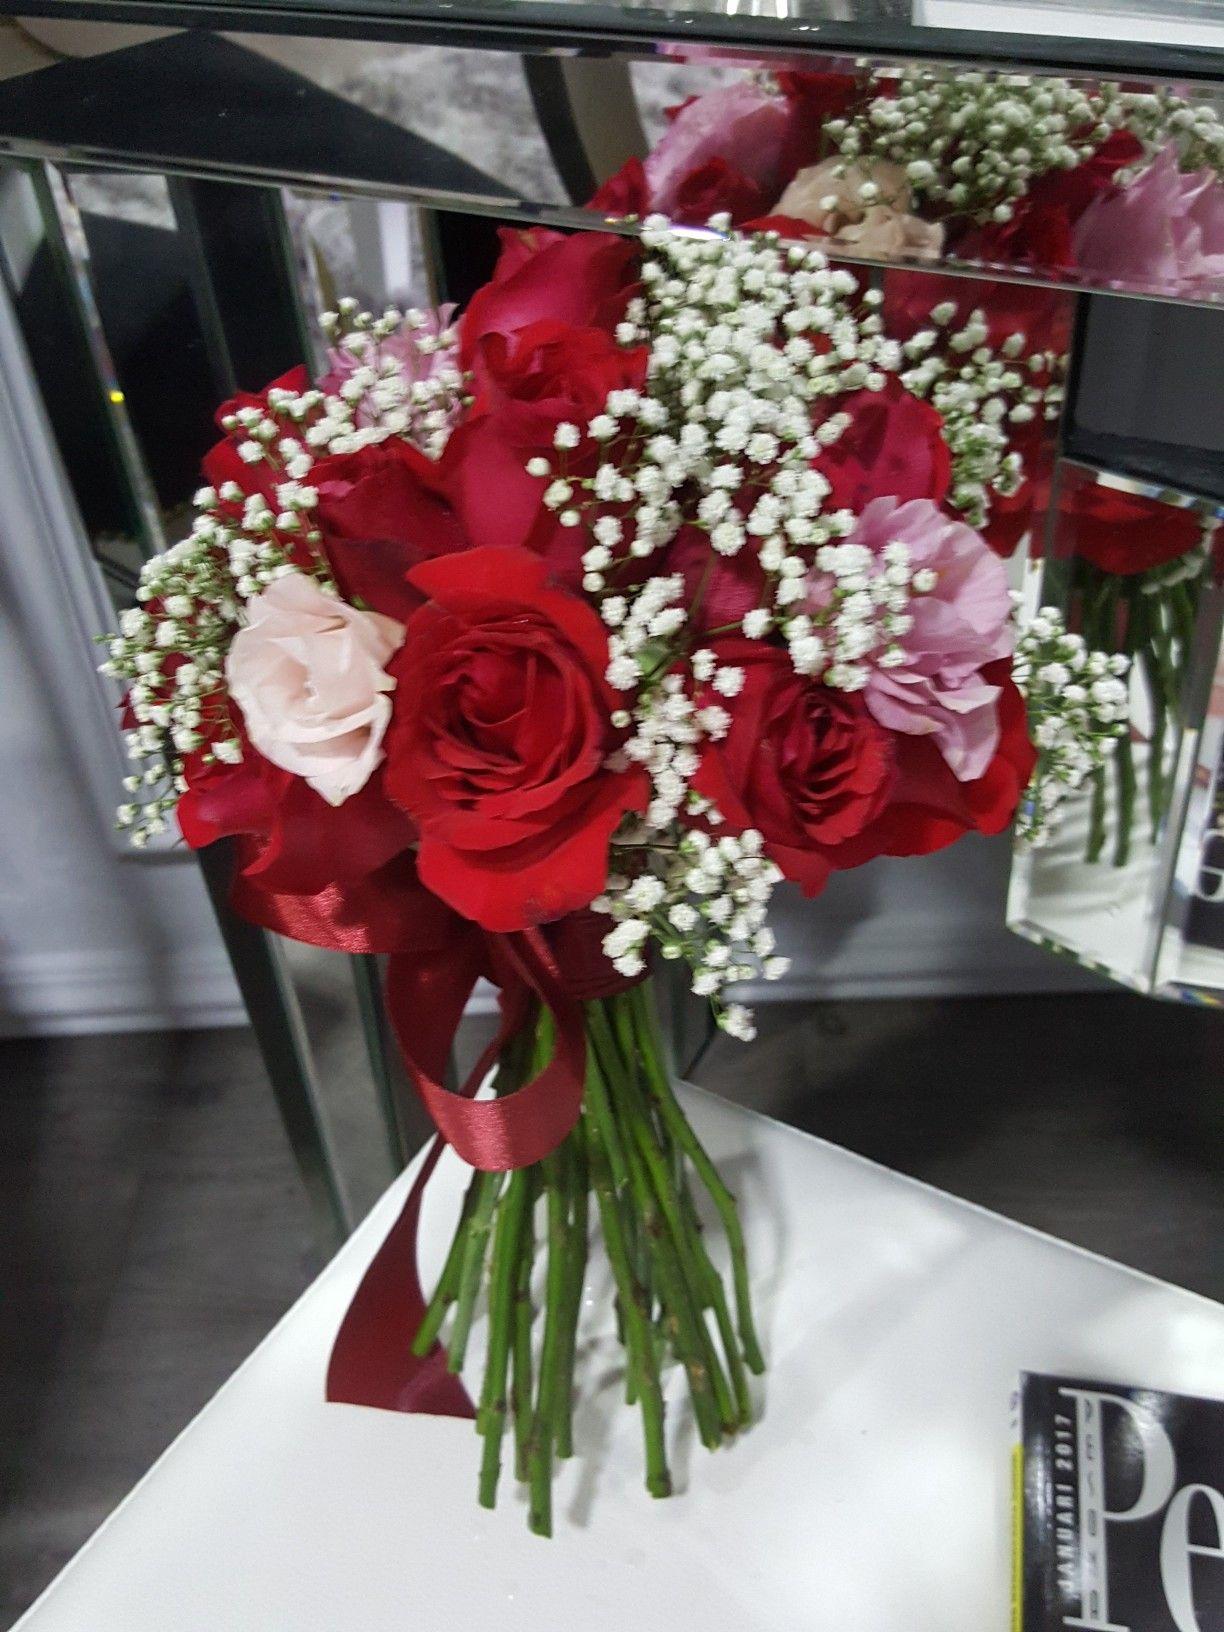 Pin by faixalcreations deco n artz on fresh flower hand bouquet hand bouquet fresh flowers bouquets hands nosegay izmirmasajfo